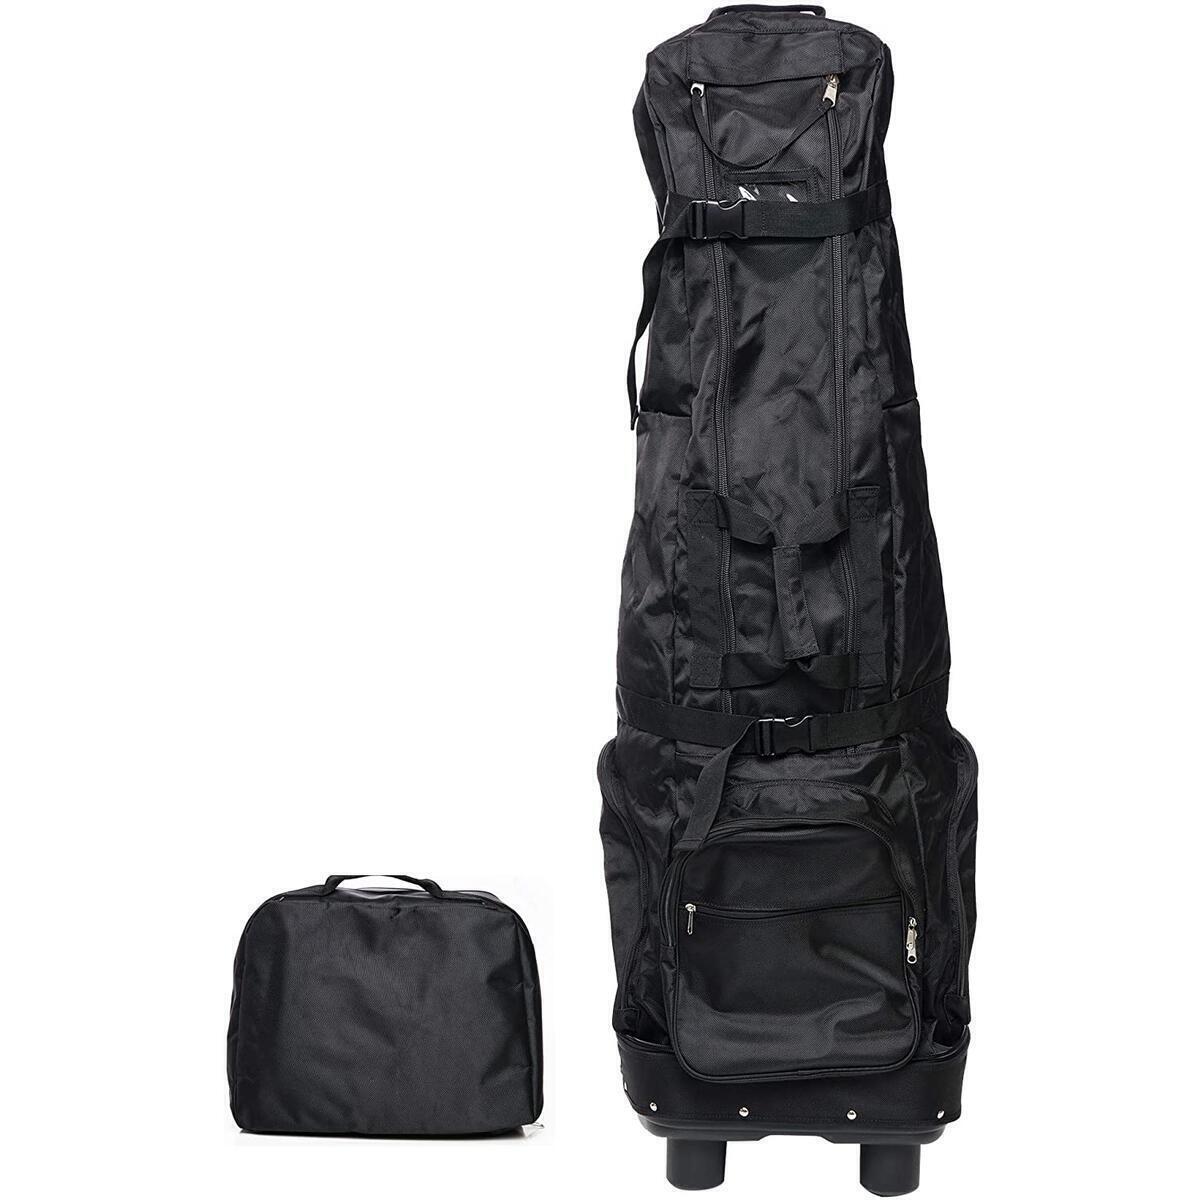 Golf Travel Bag on Wheels